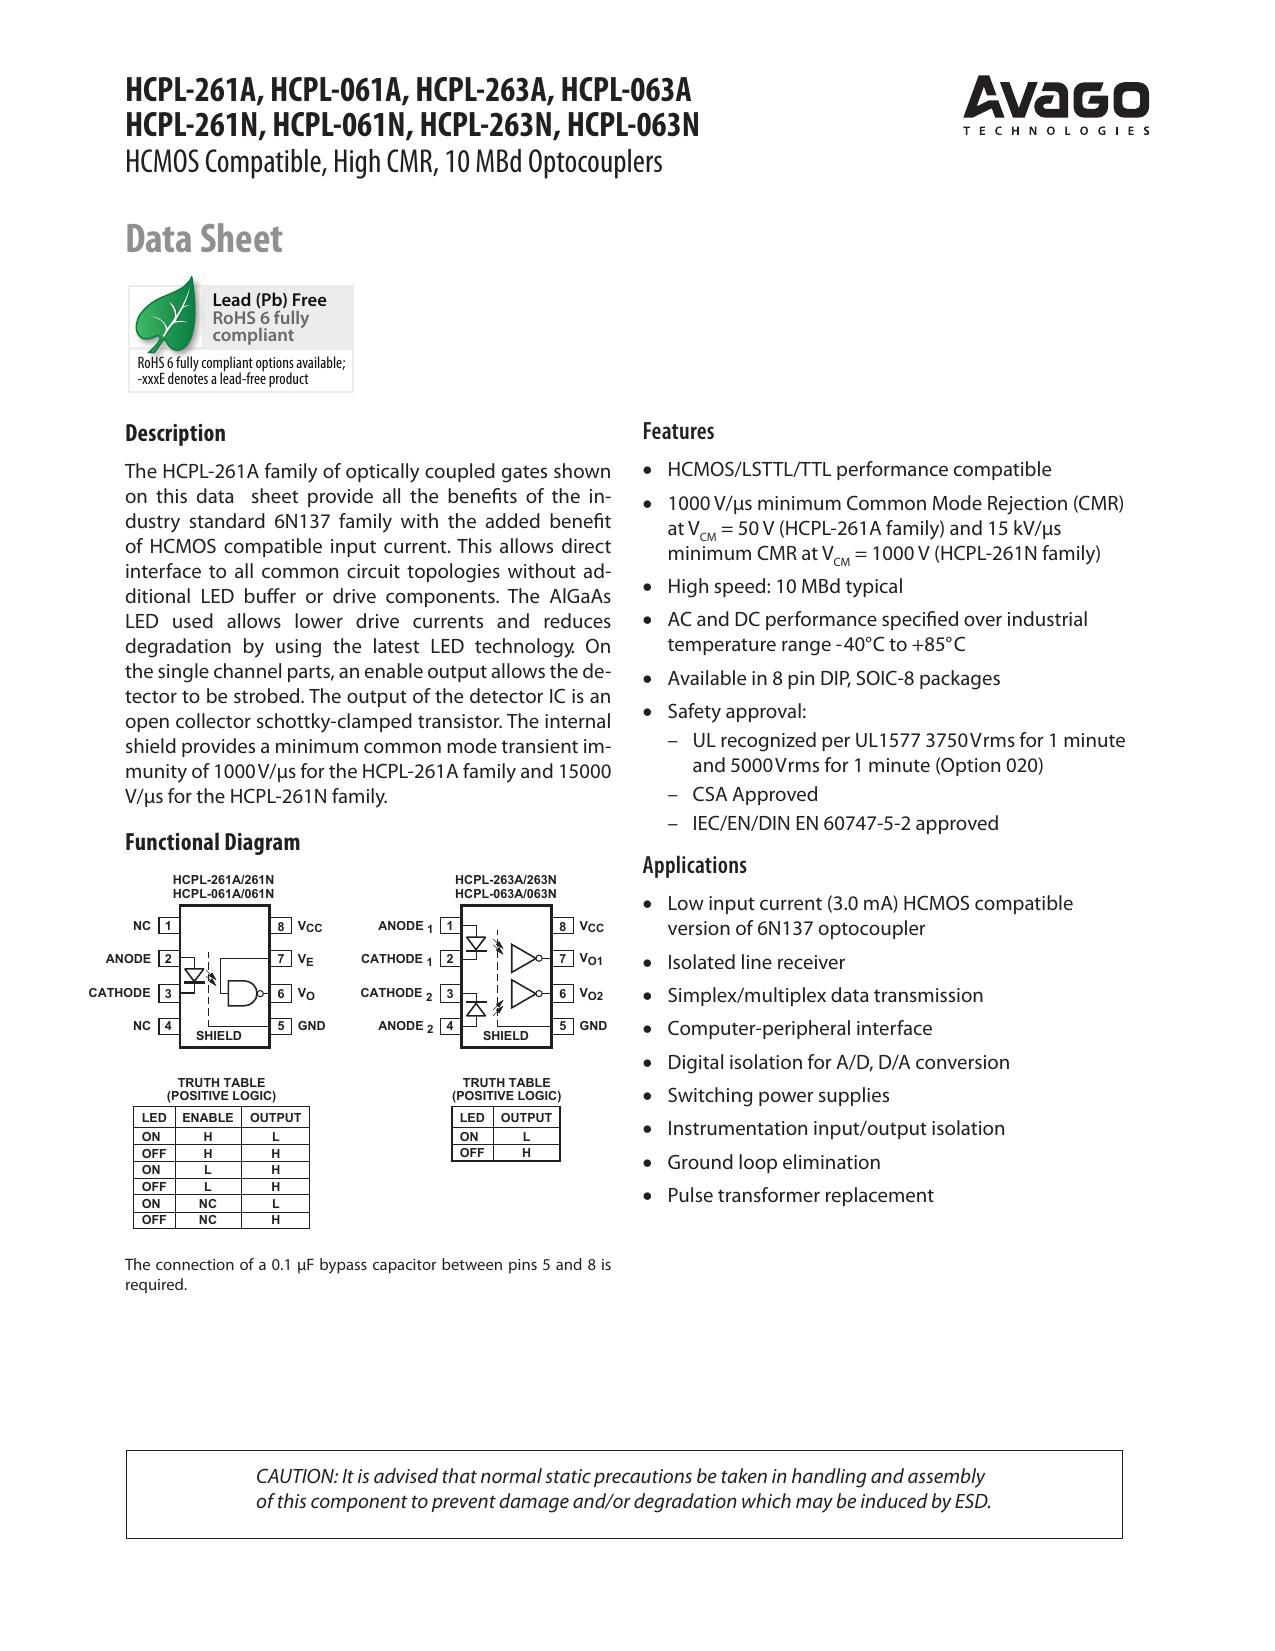 3750VRMS LOGIC GATE 1 piece AVAGO TECHNOLOGIES HCPL-2630-000E OPTOCOUPLER